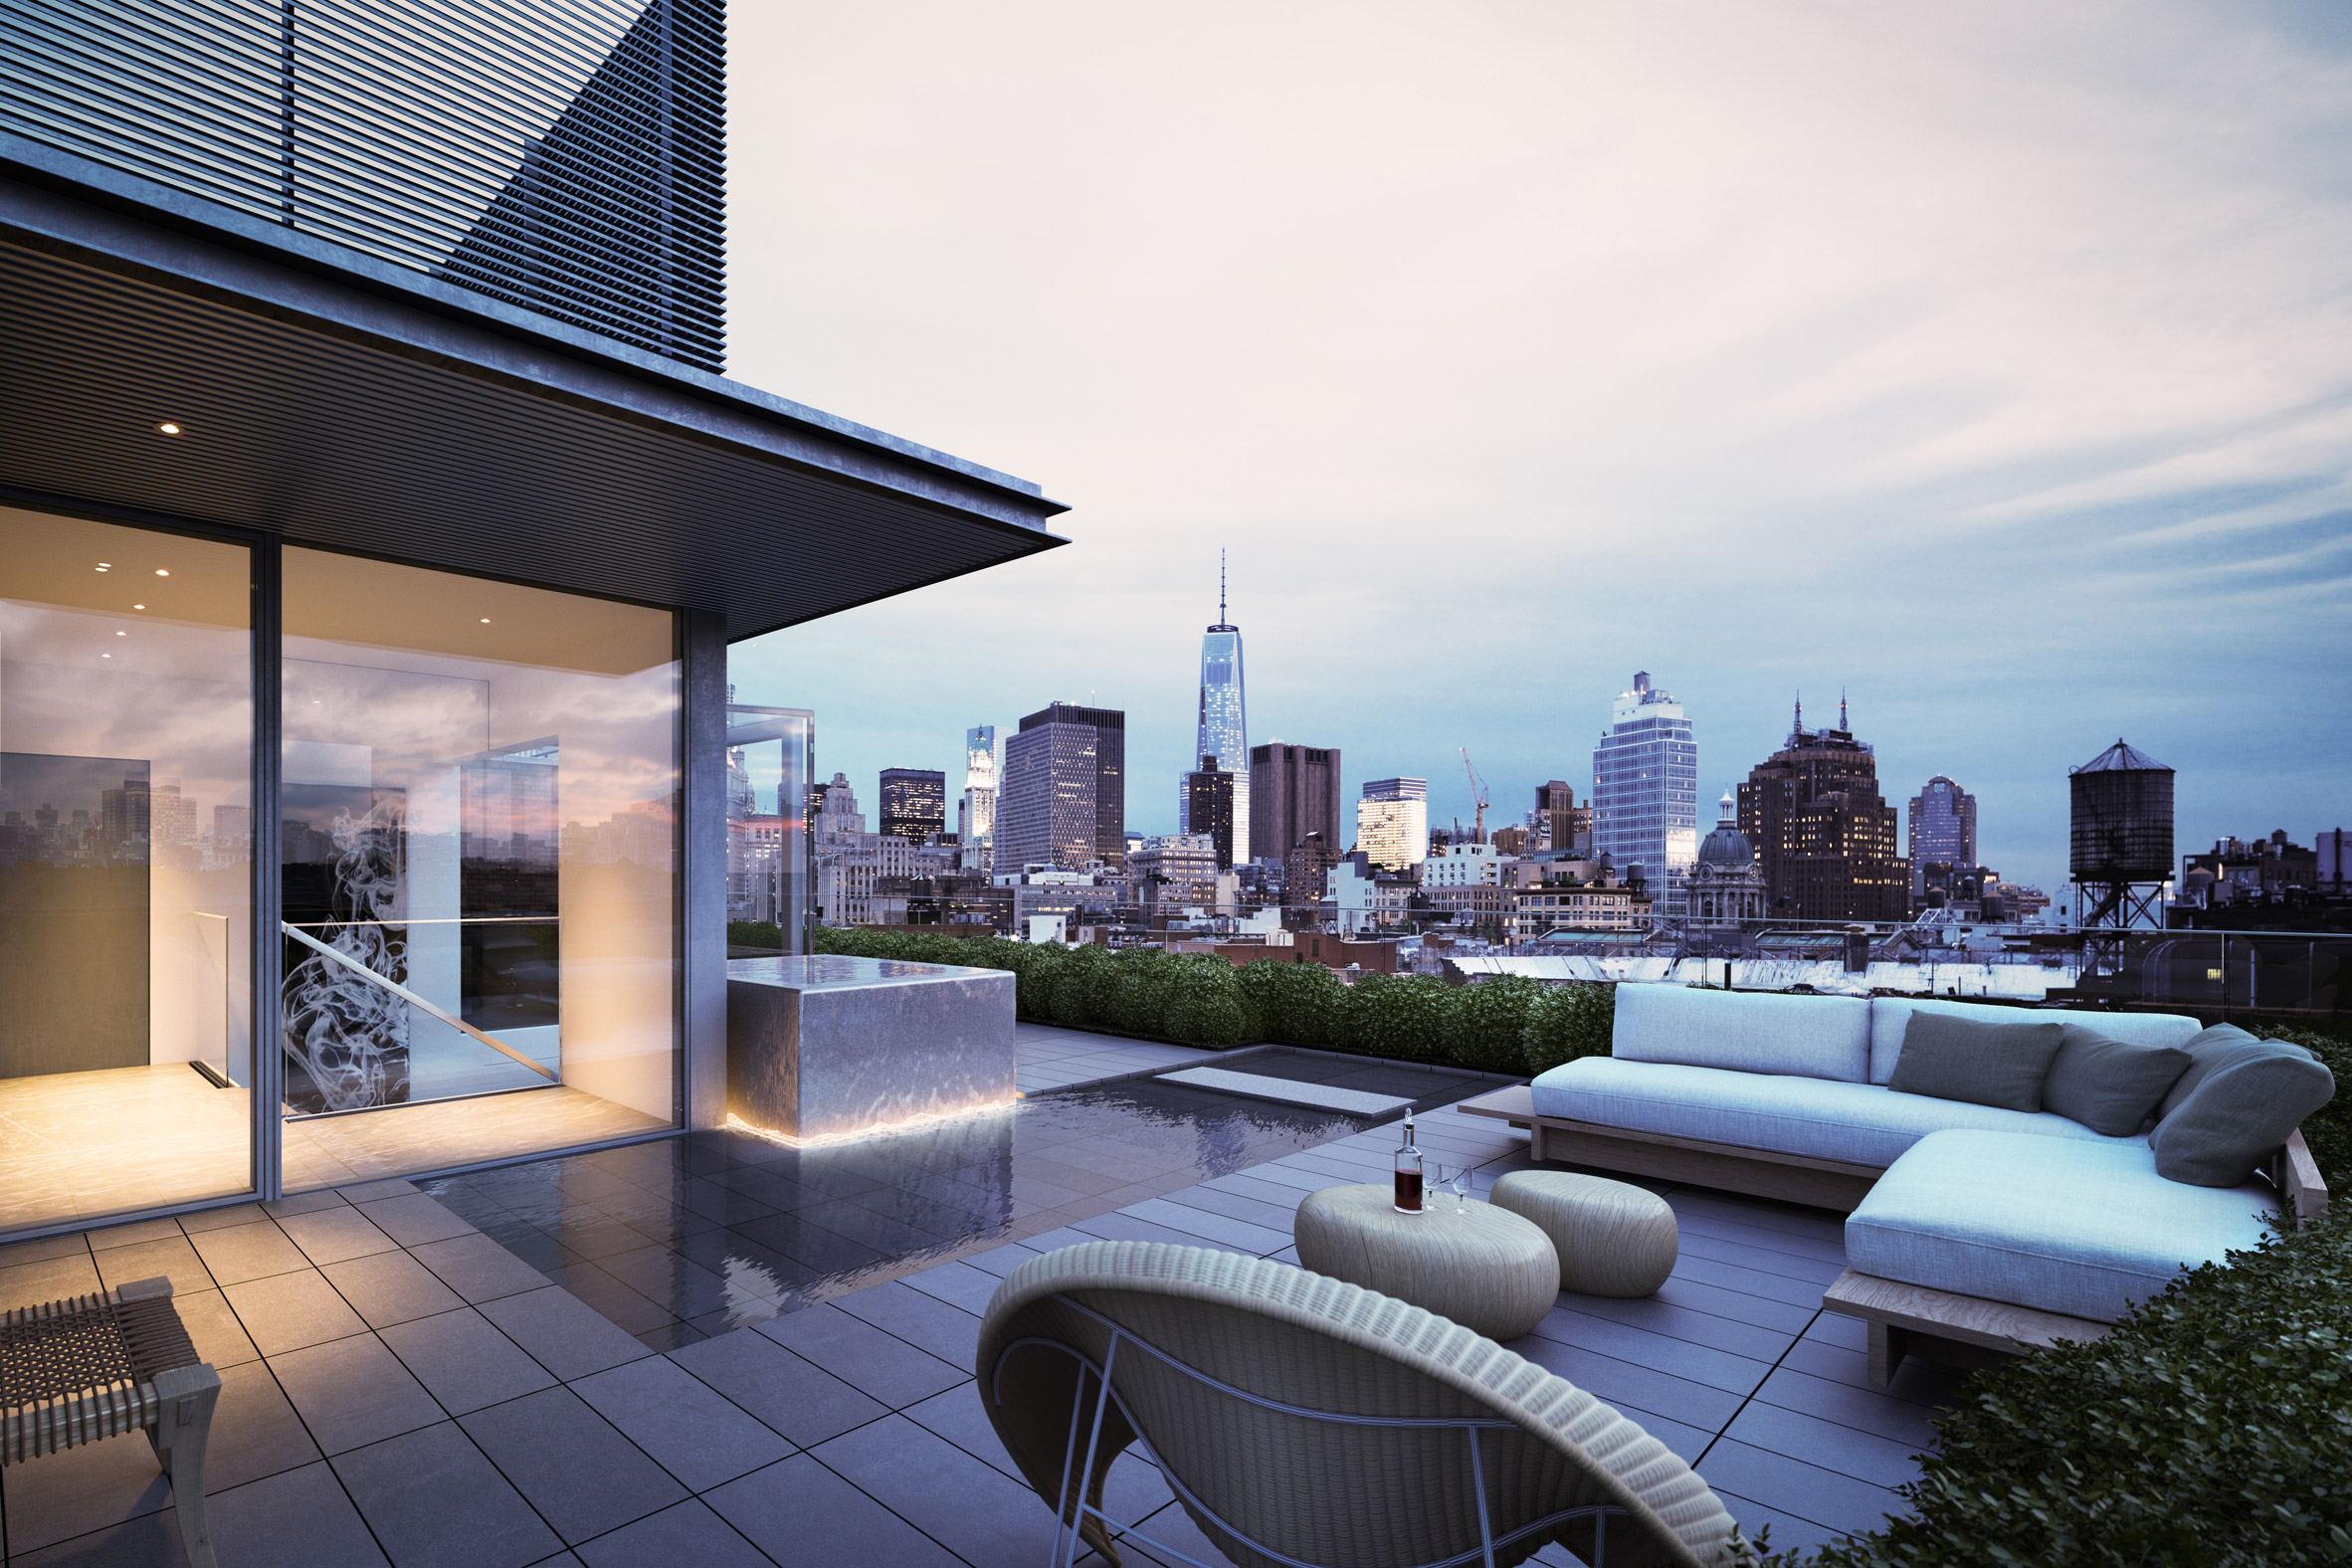 Thiết kế nội thất căn hộ Duplex 1